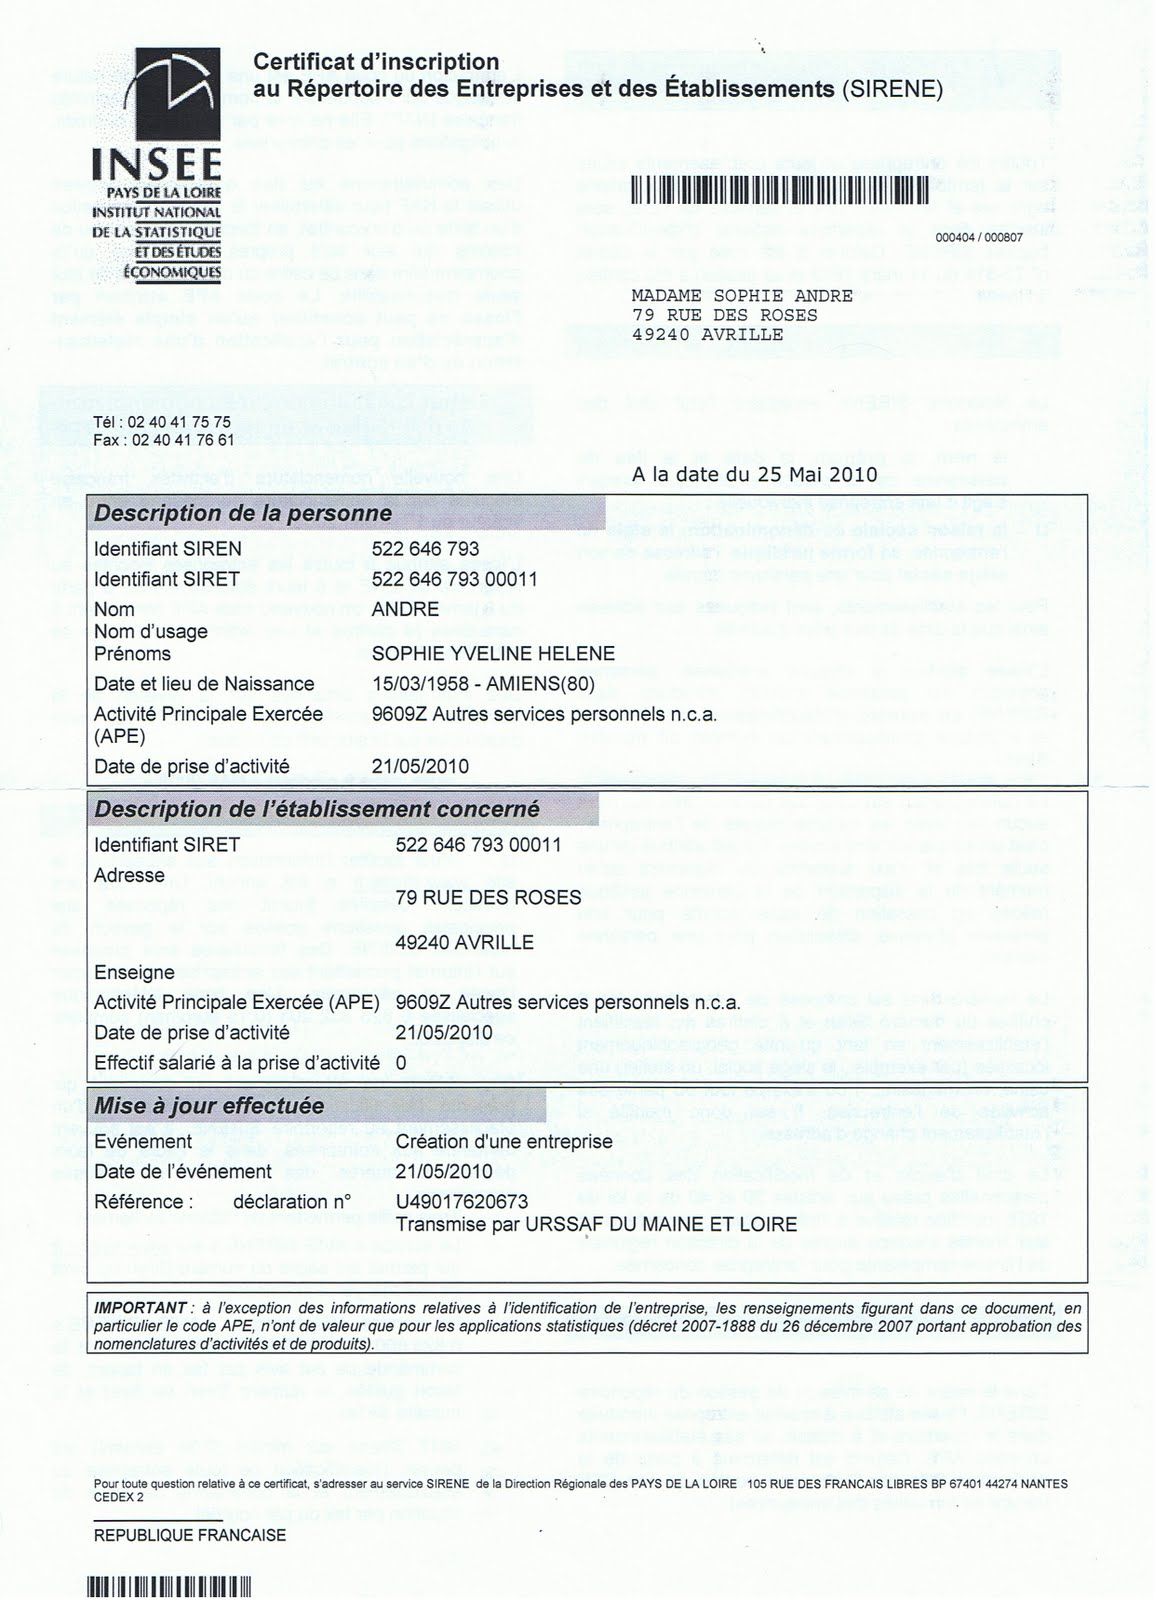 B T 39 Adom 39 Avrill Certificat De Capacit N Siret